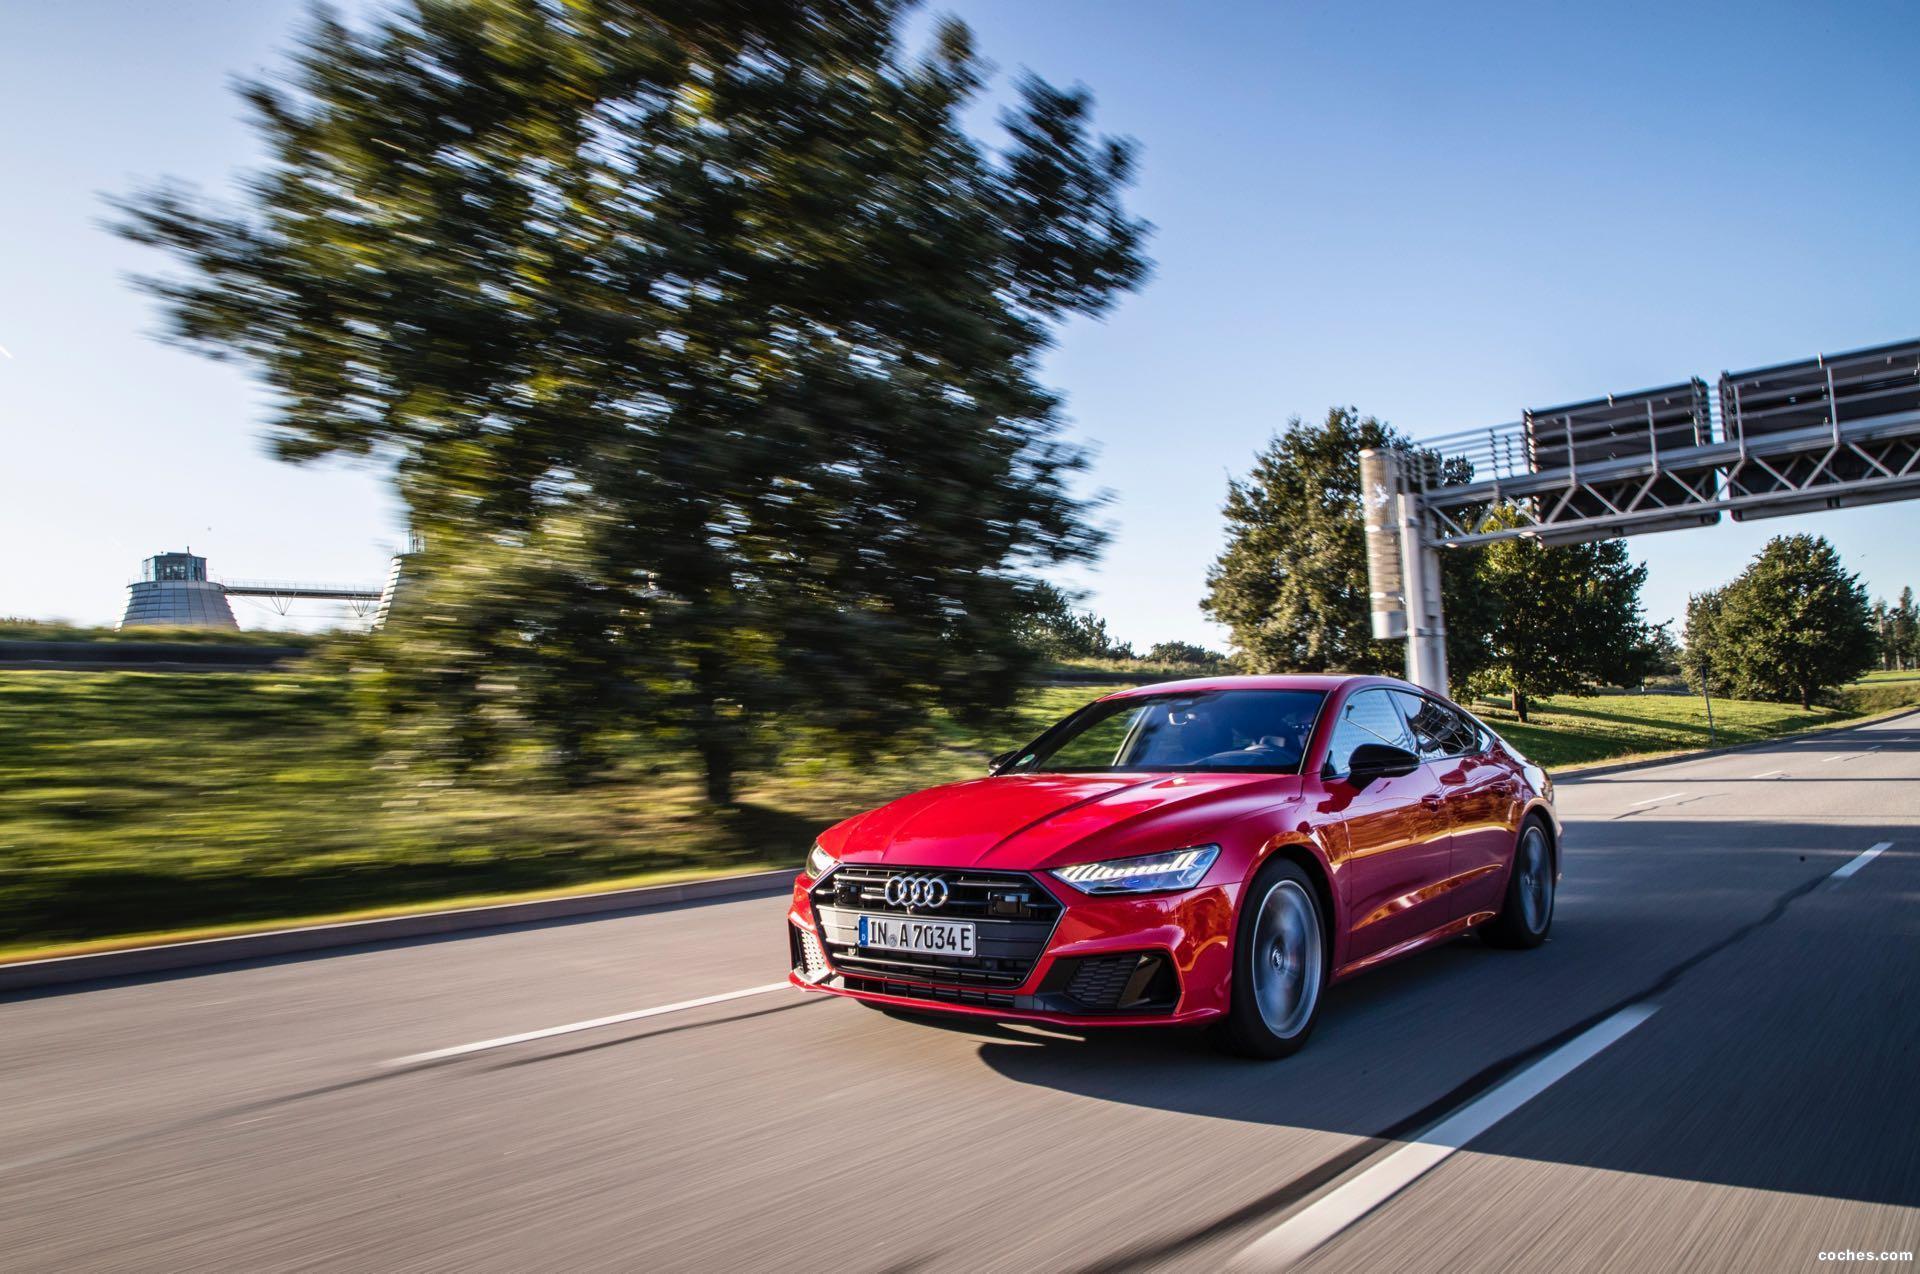 Foto 0 de Audi A7 Sportback 55 TFSIe Quattro 2019